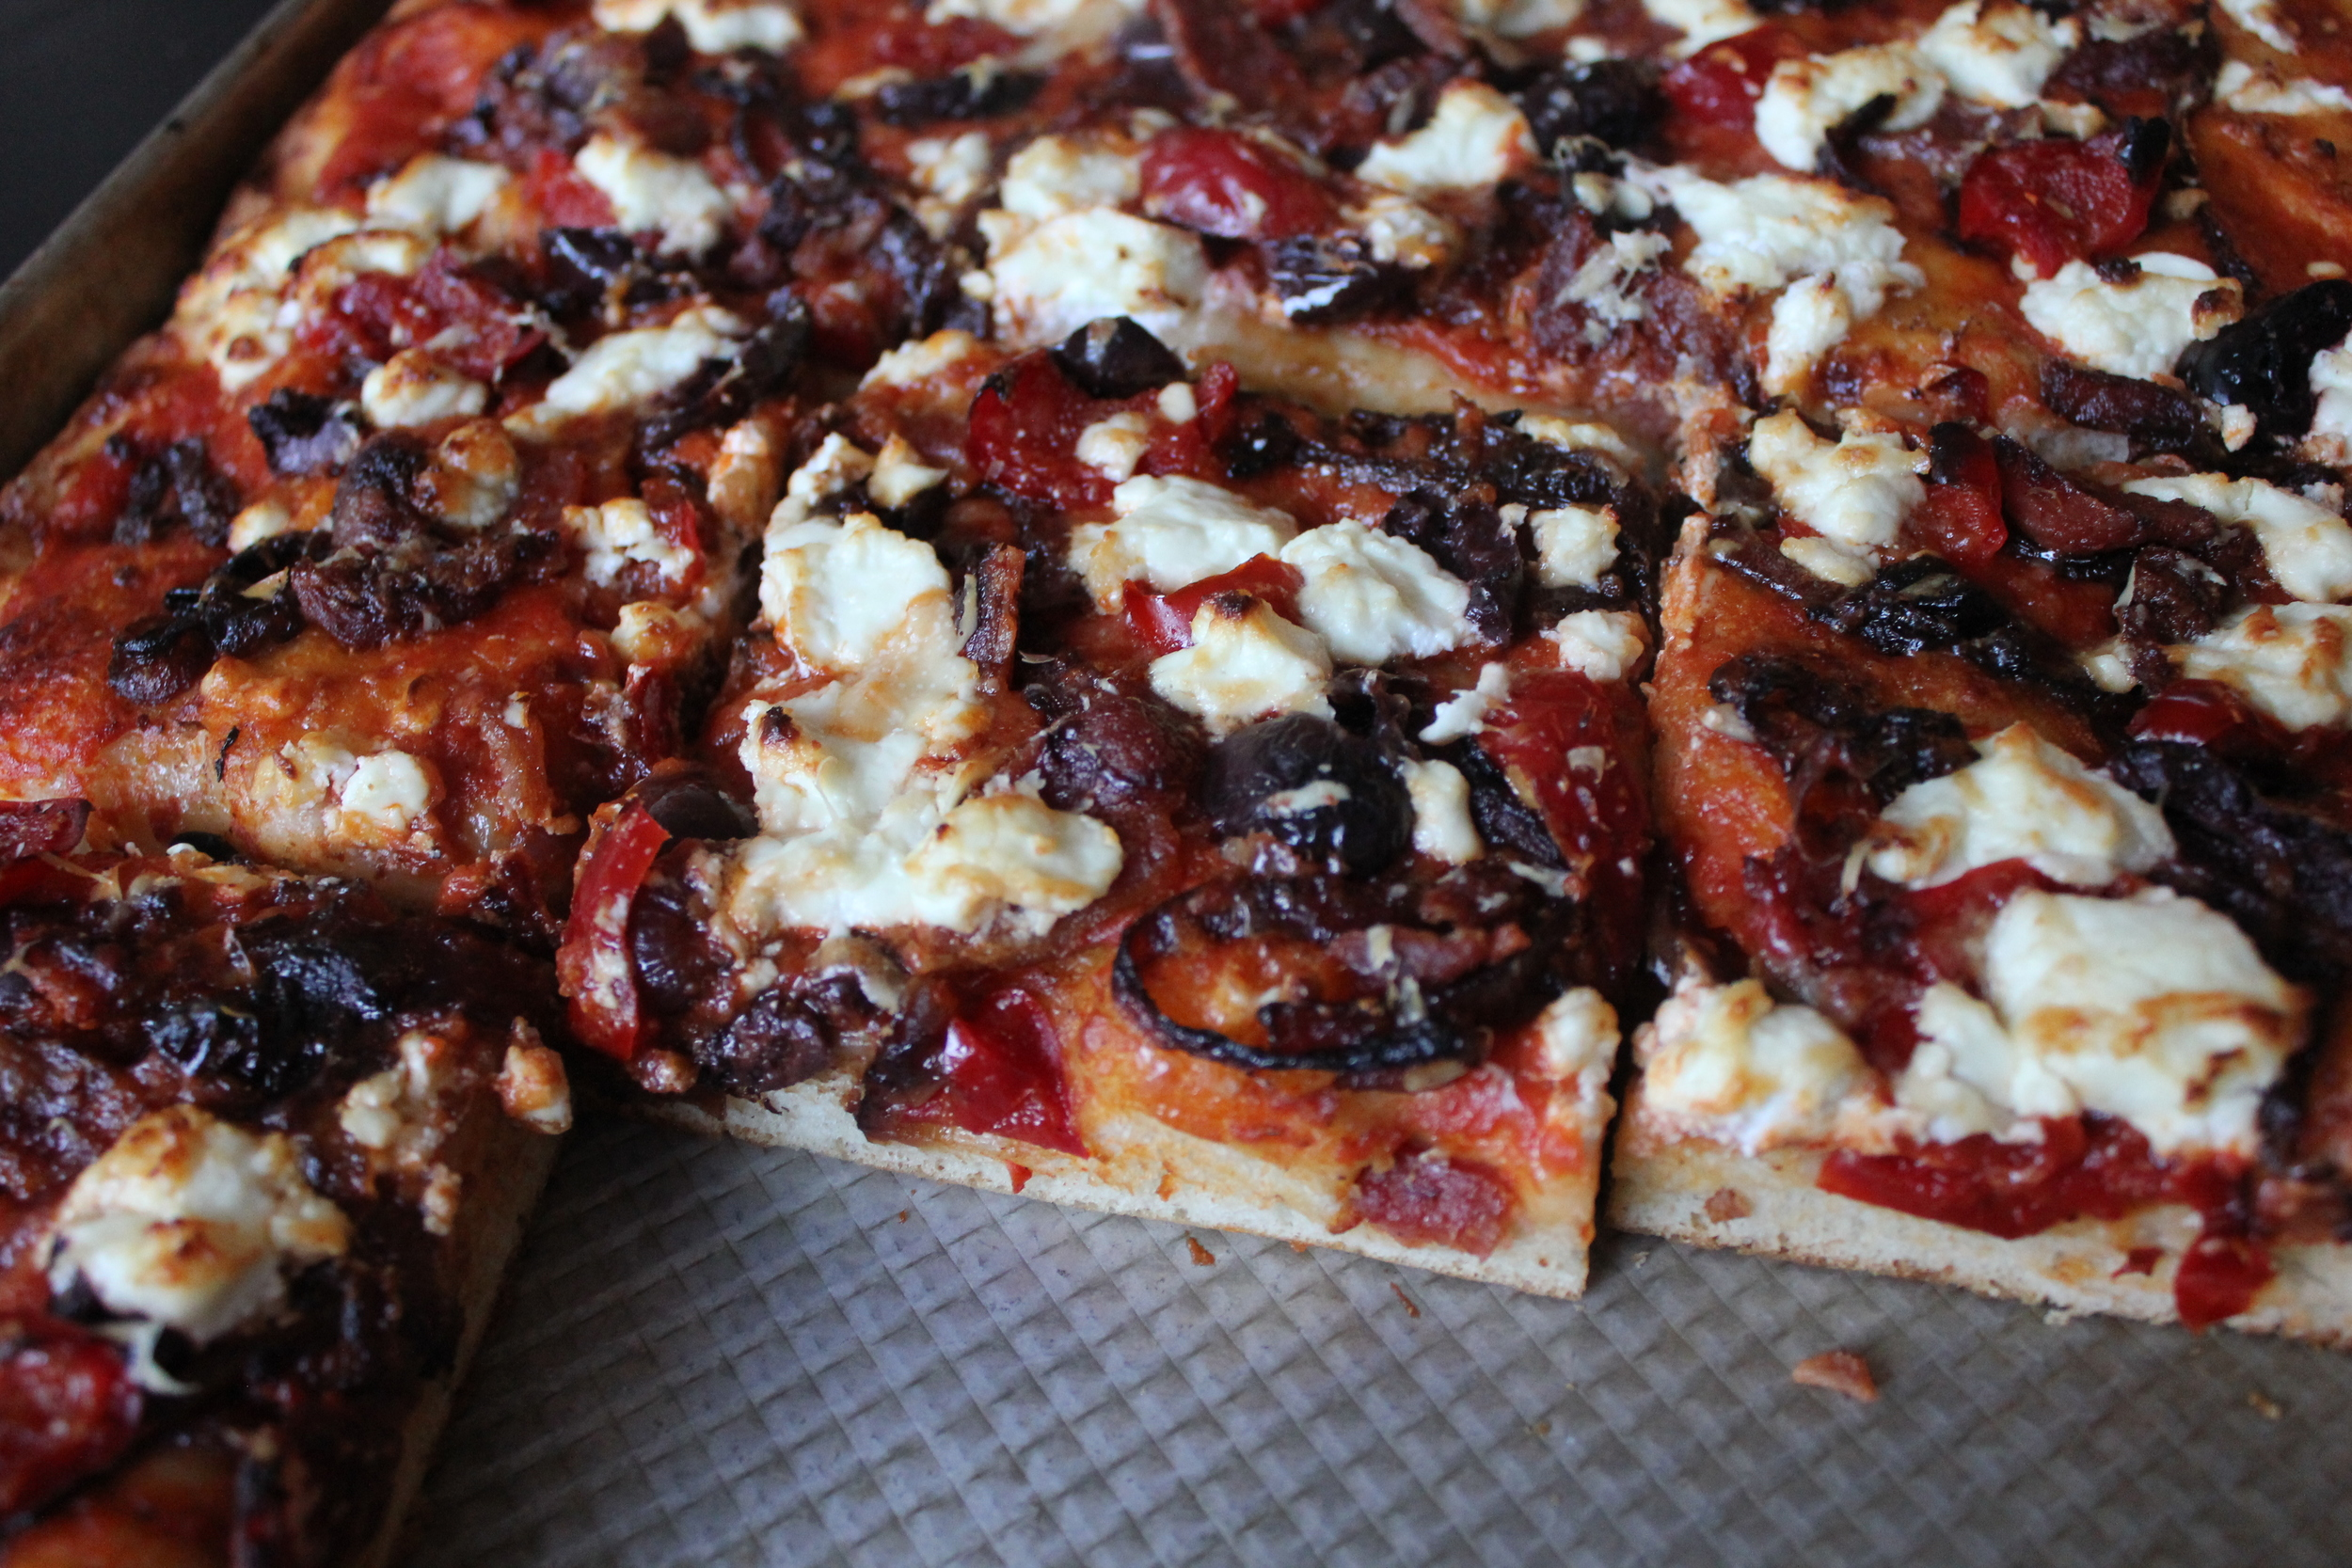 Homemade Grandma Pizza Pie from Bon Appetit - www.fancycasual.com